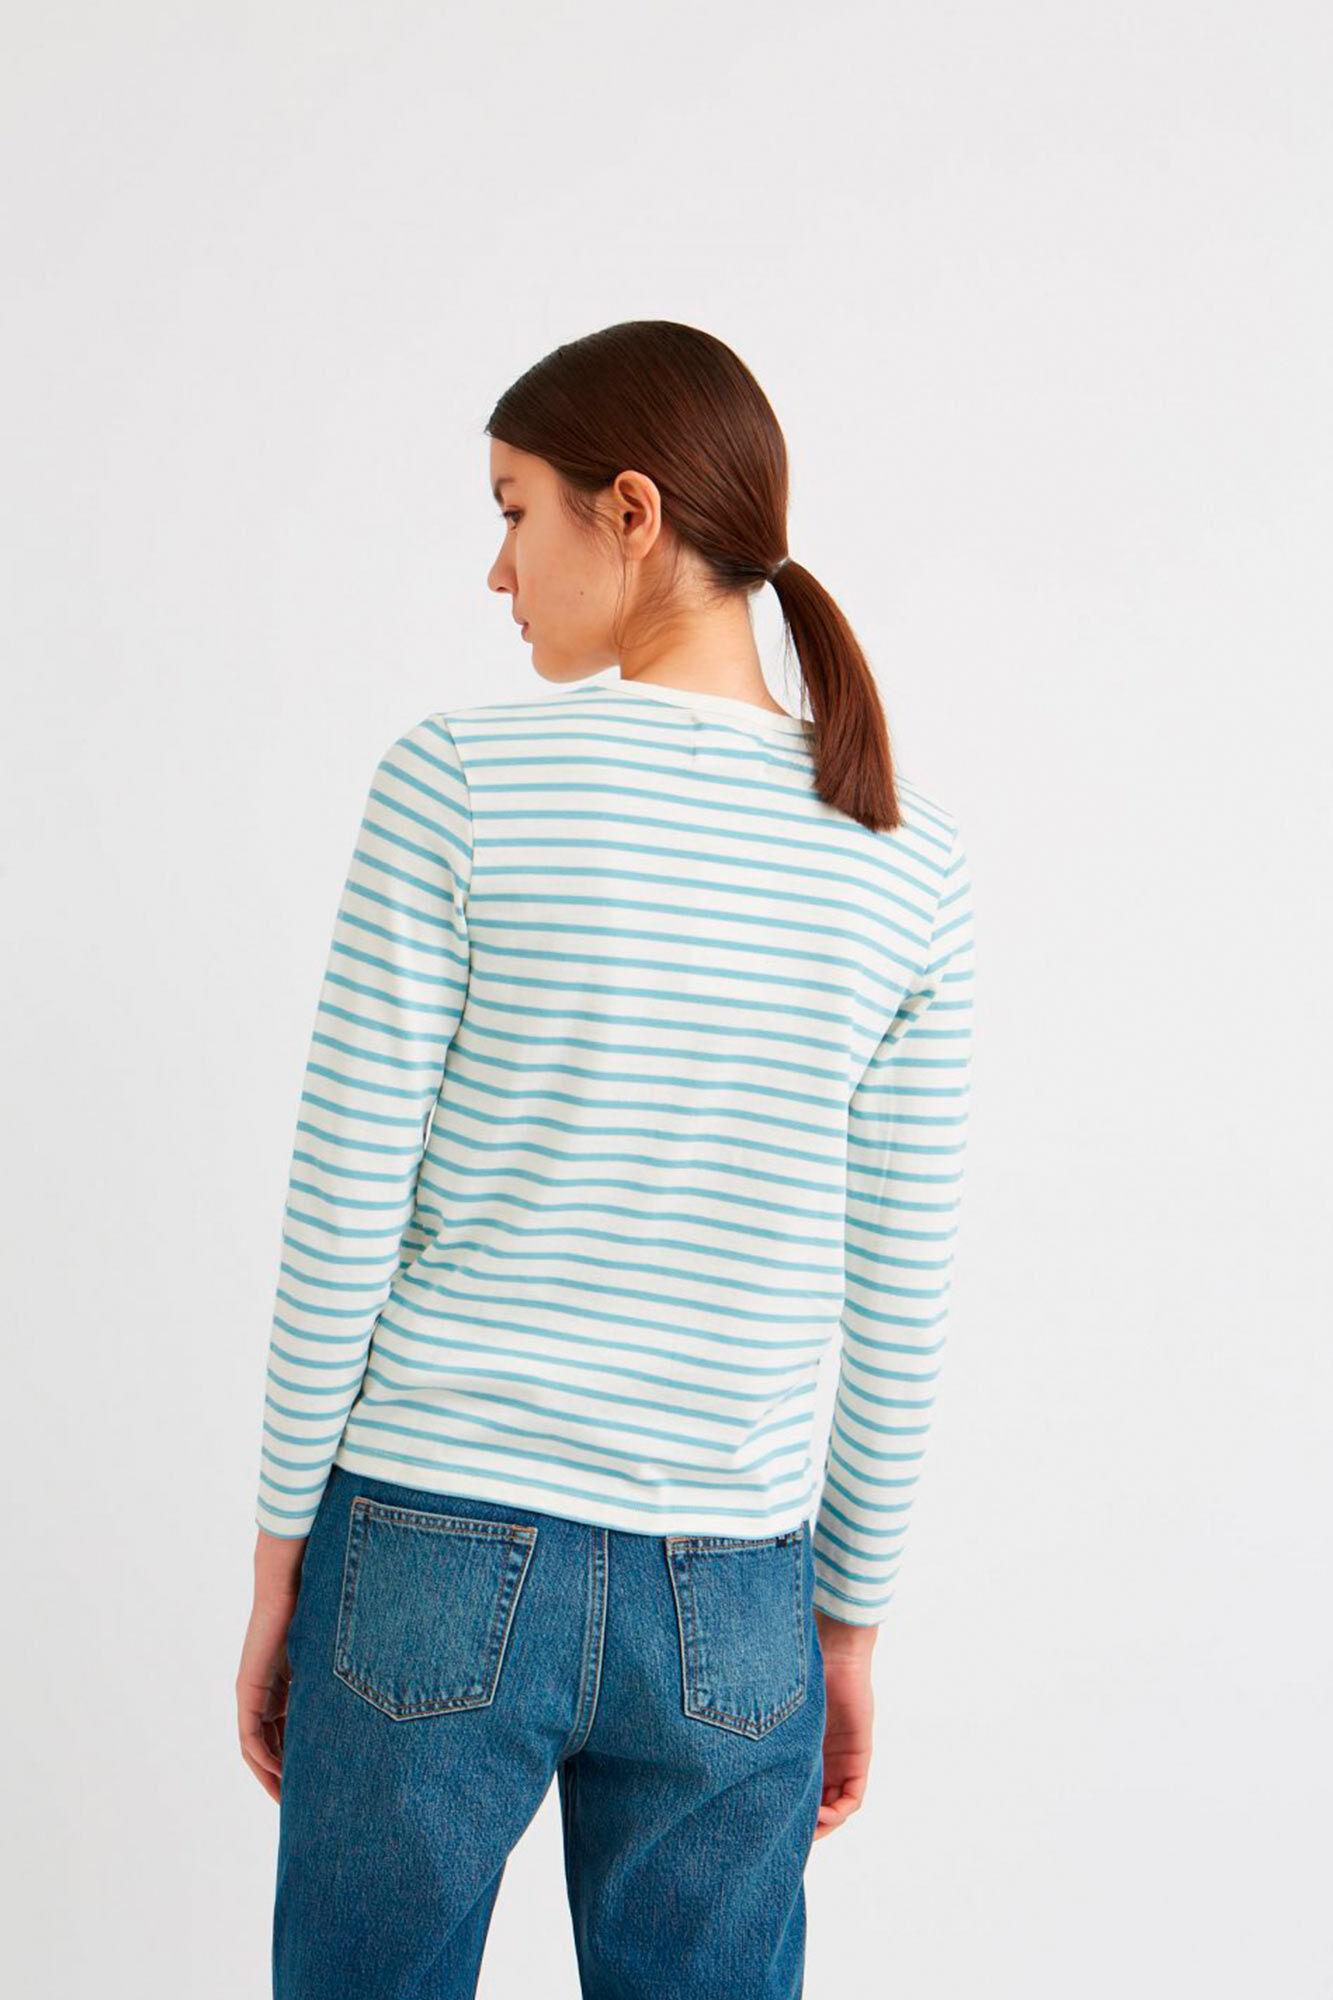 Moa long sleeve 10931500-2323, OFF-WHITE/BLUE STRIPES